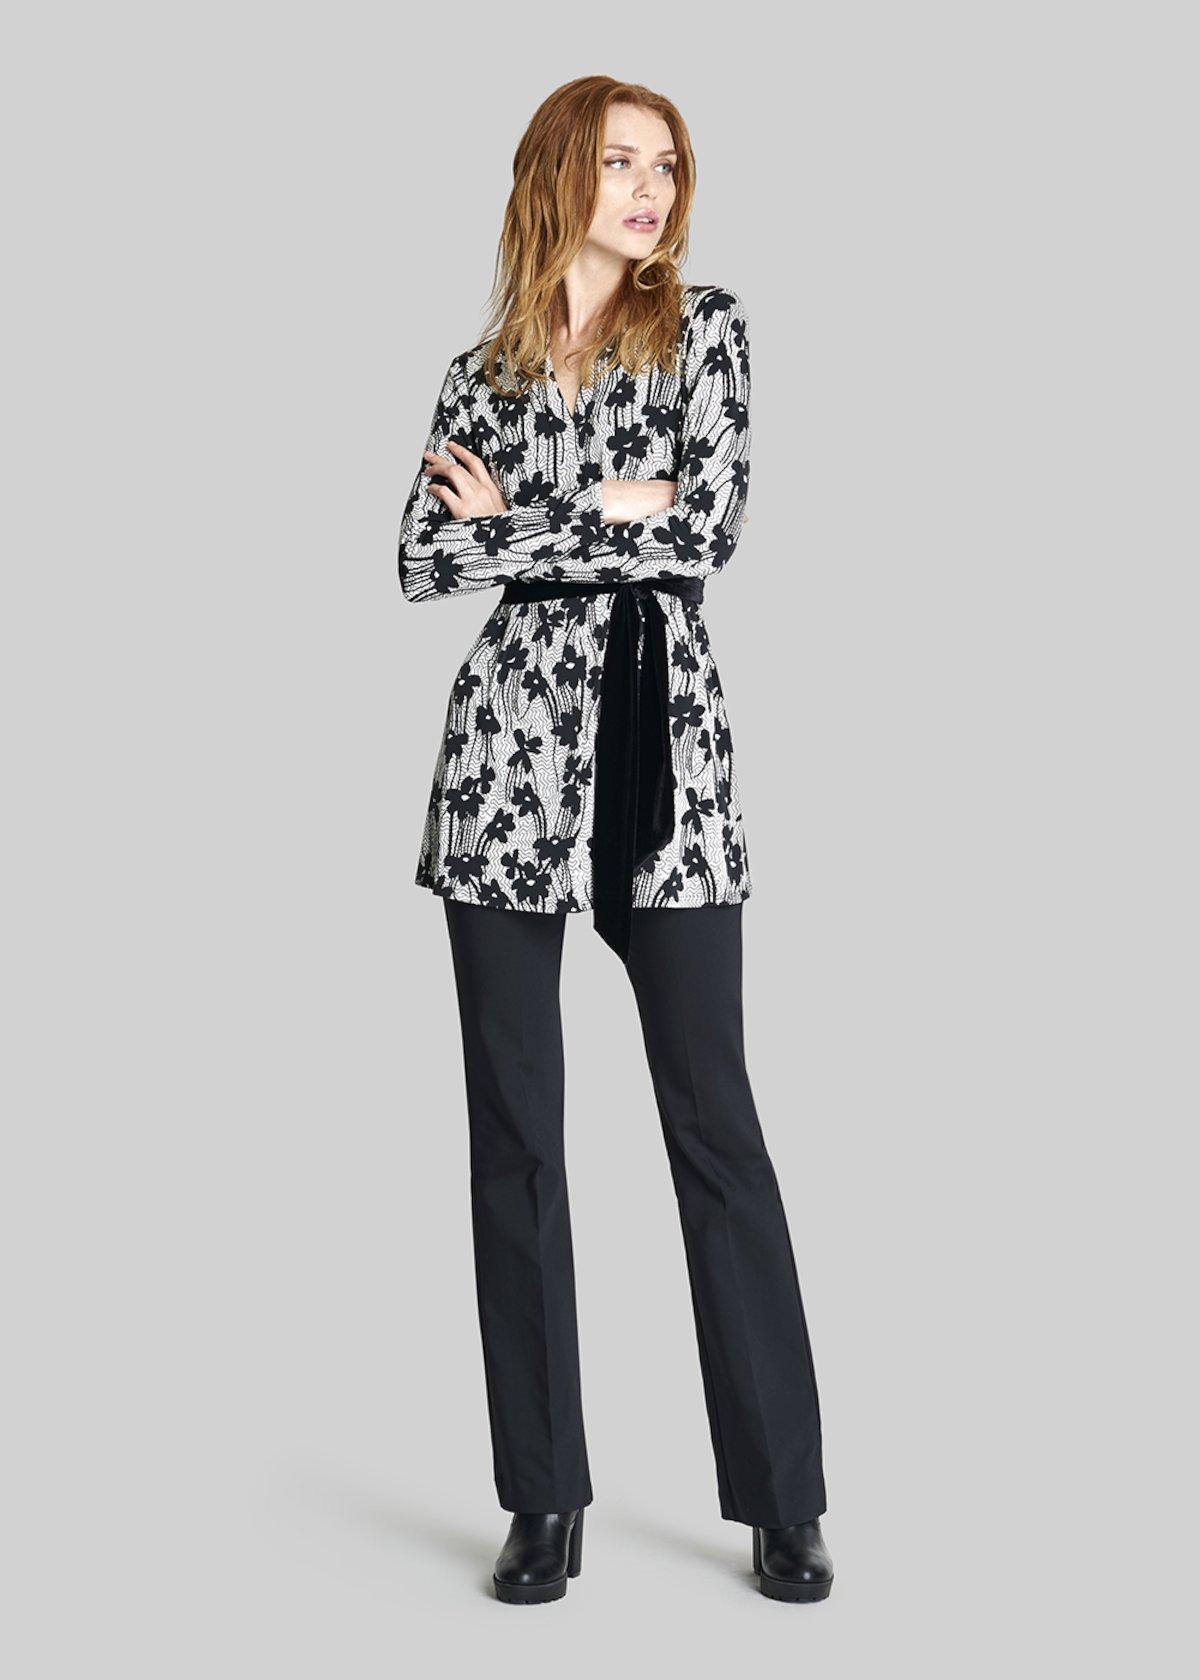 Shila Long jersey t-shirt alice flowers fantasy - Black White Fantasia - Woman - Category image